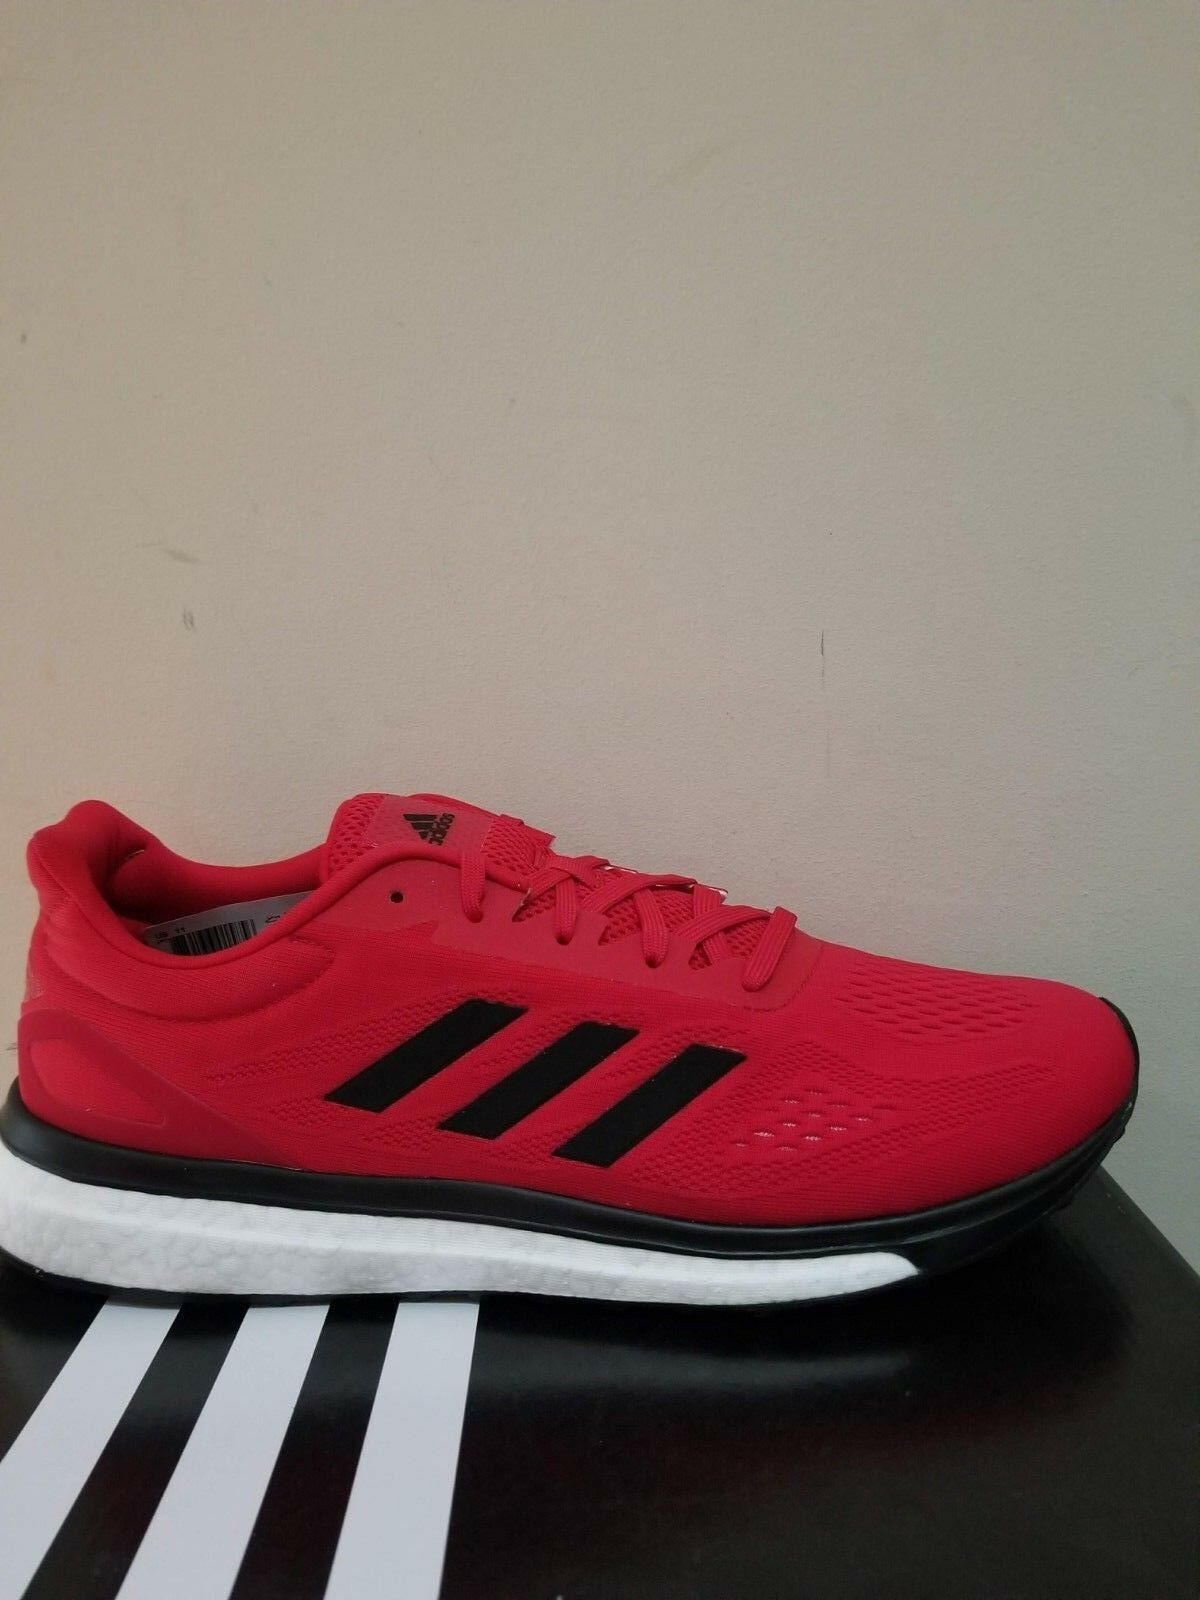 Adidas Response LT Running  Sneakers Size 11 NIB